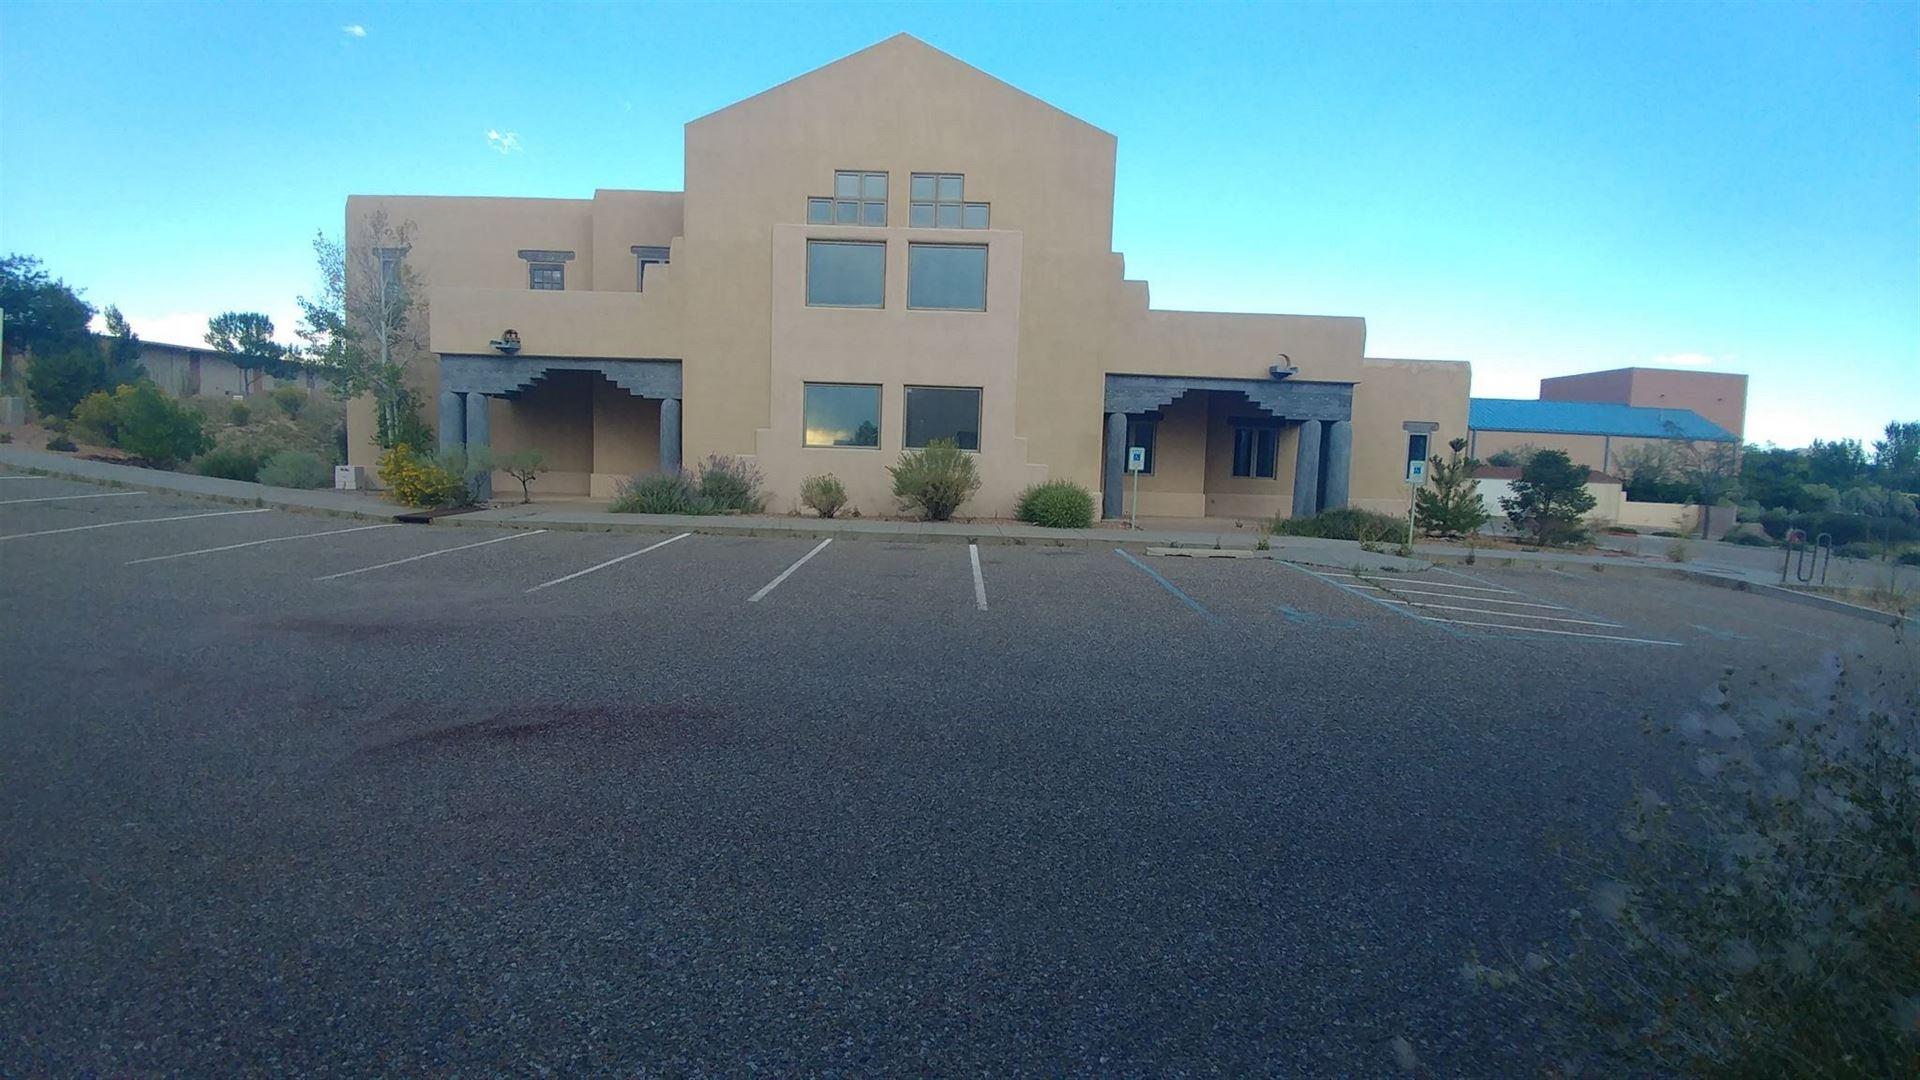 Photo for 124 SIRINGO ROAD, Santa Fe, NM 87505 (MLS # 201904065)